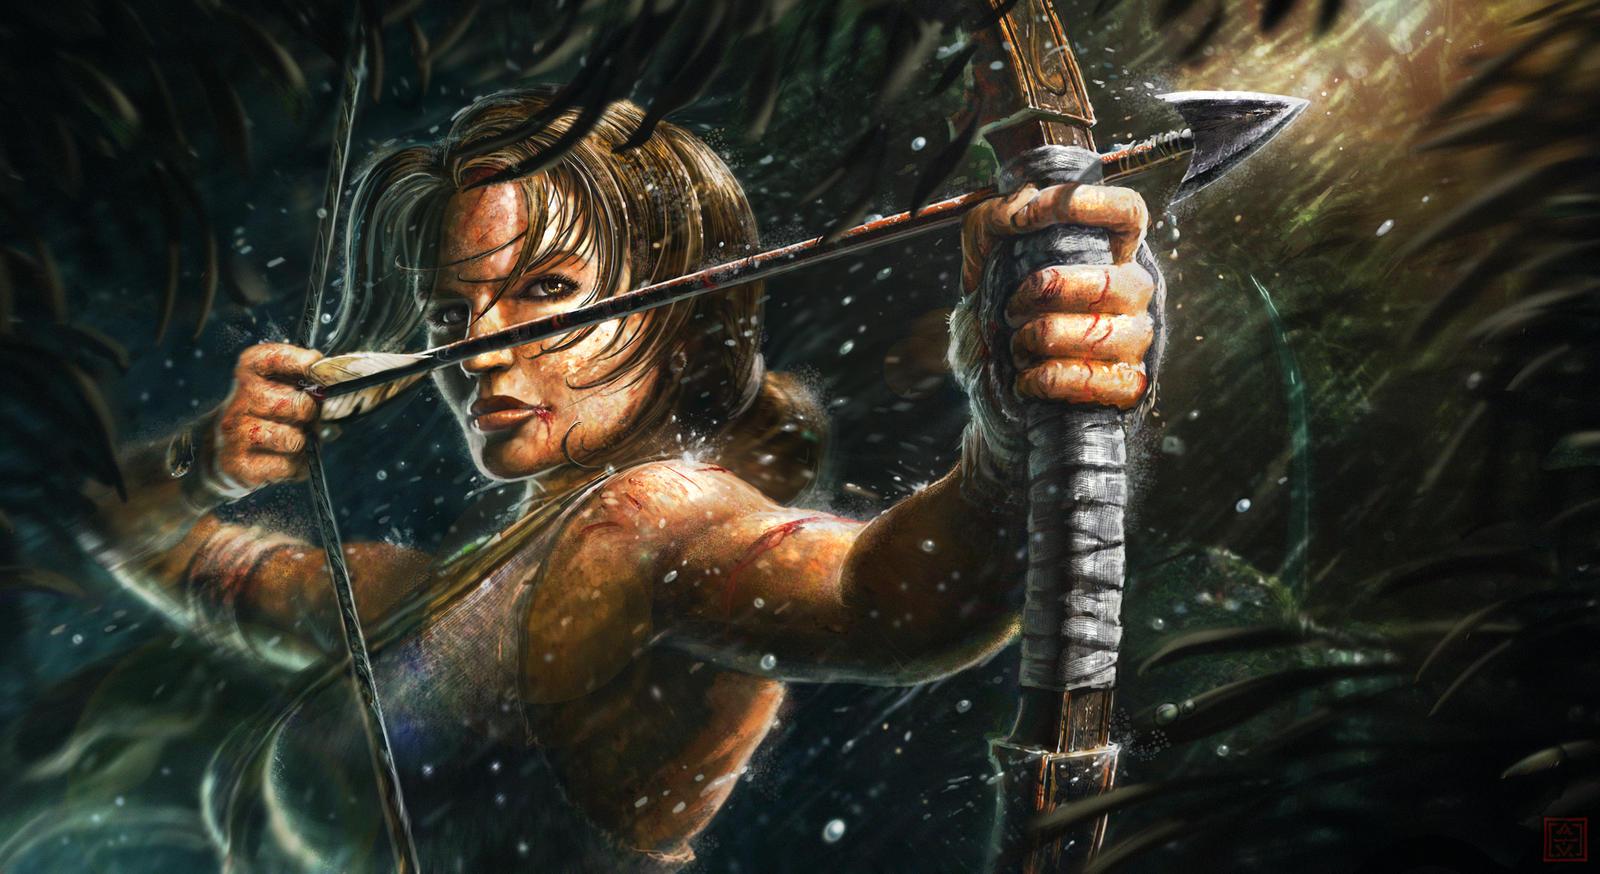 Tomb Raider Reborn Entry By VegasMike On DeviantArt